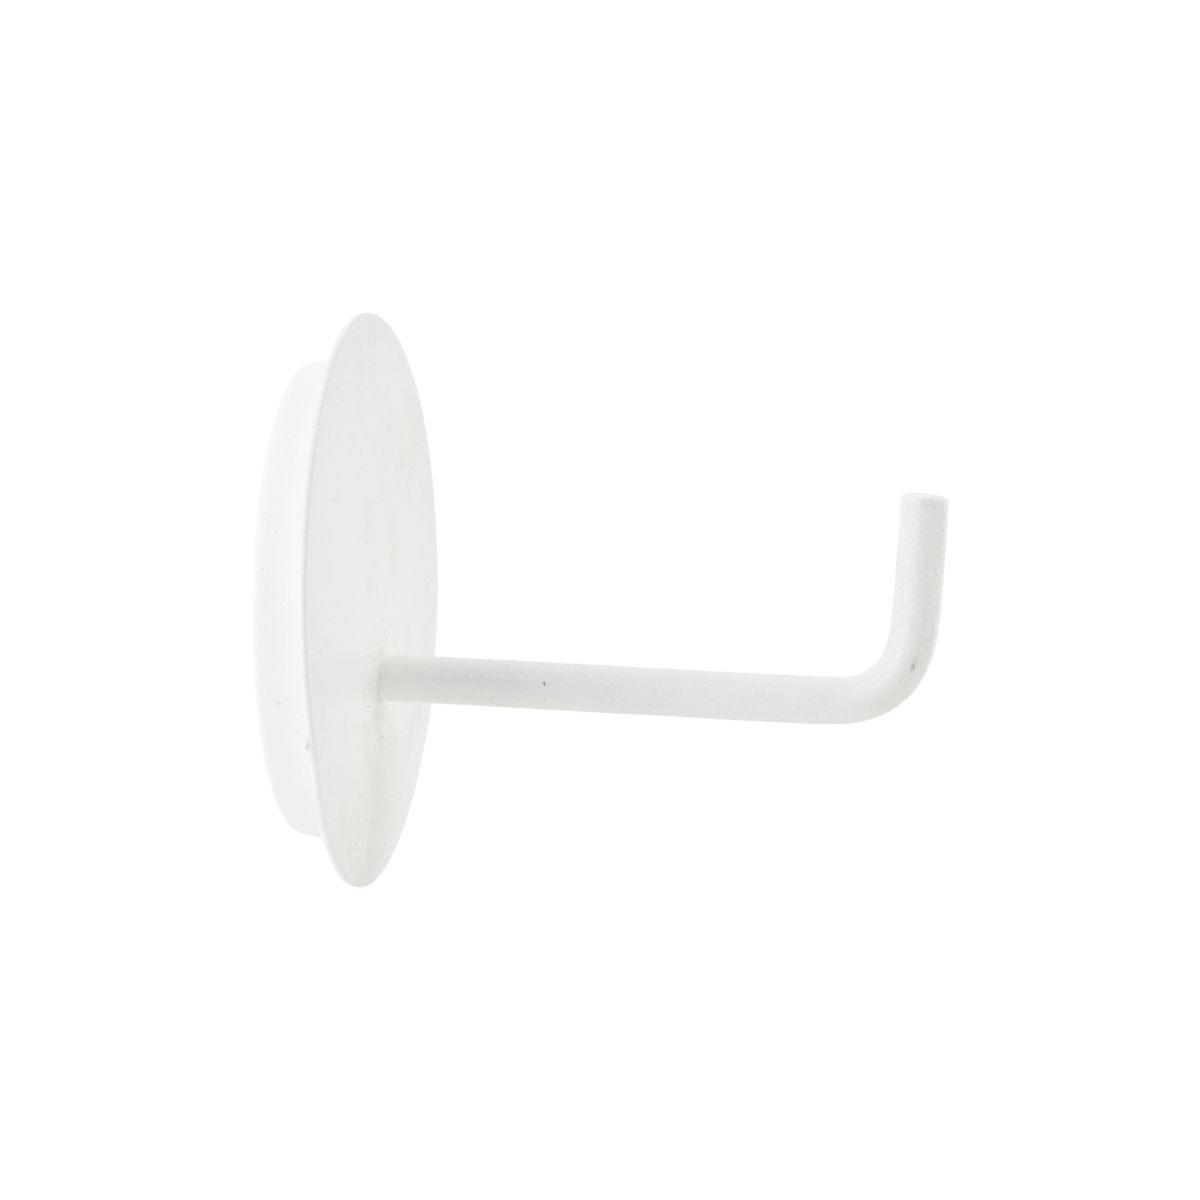 house doctor Držák na toaletní papír White Texture, bílá barva, kov